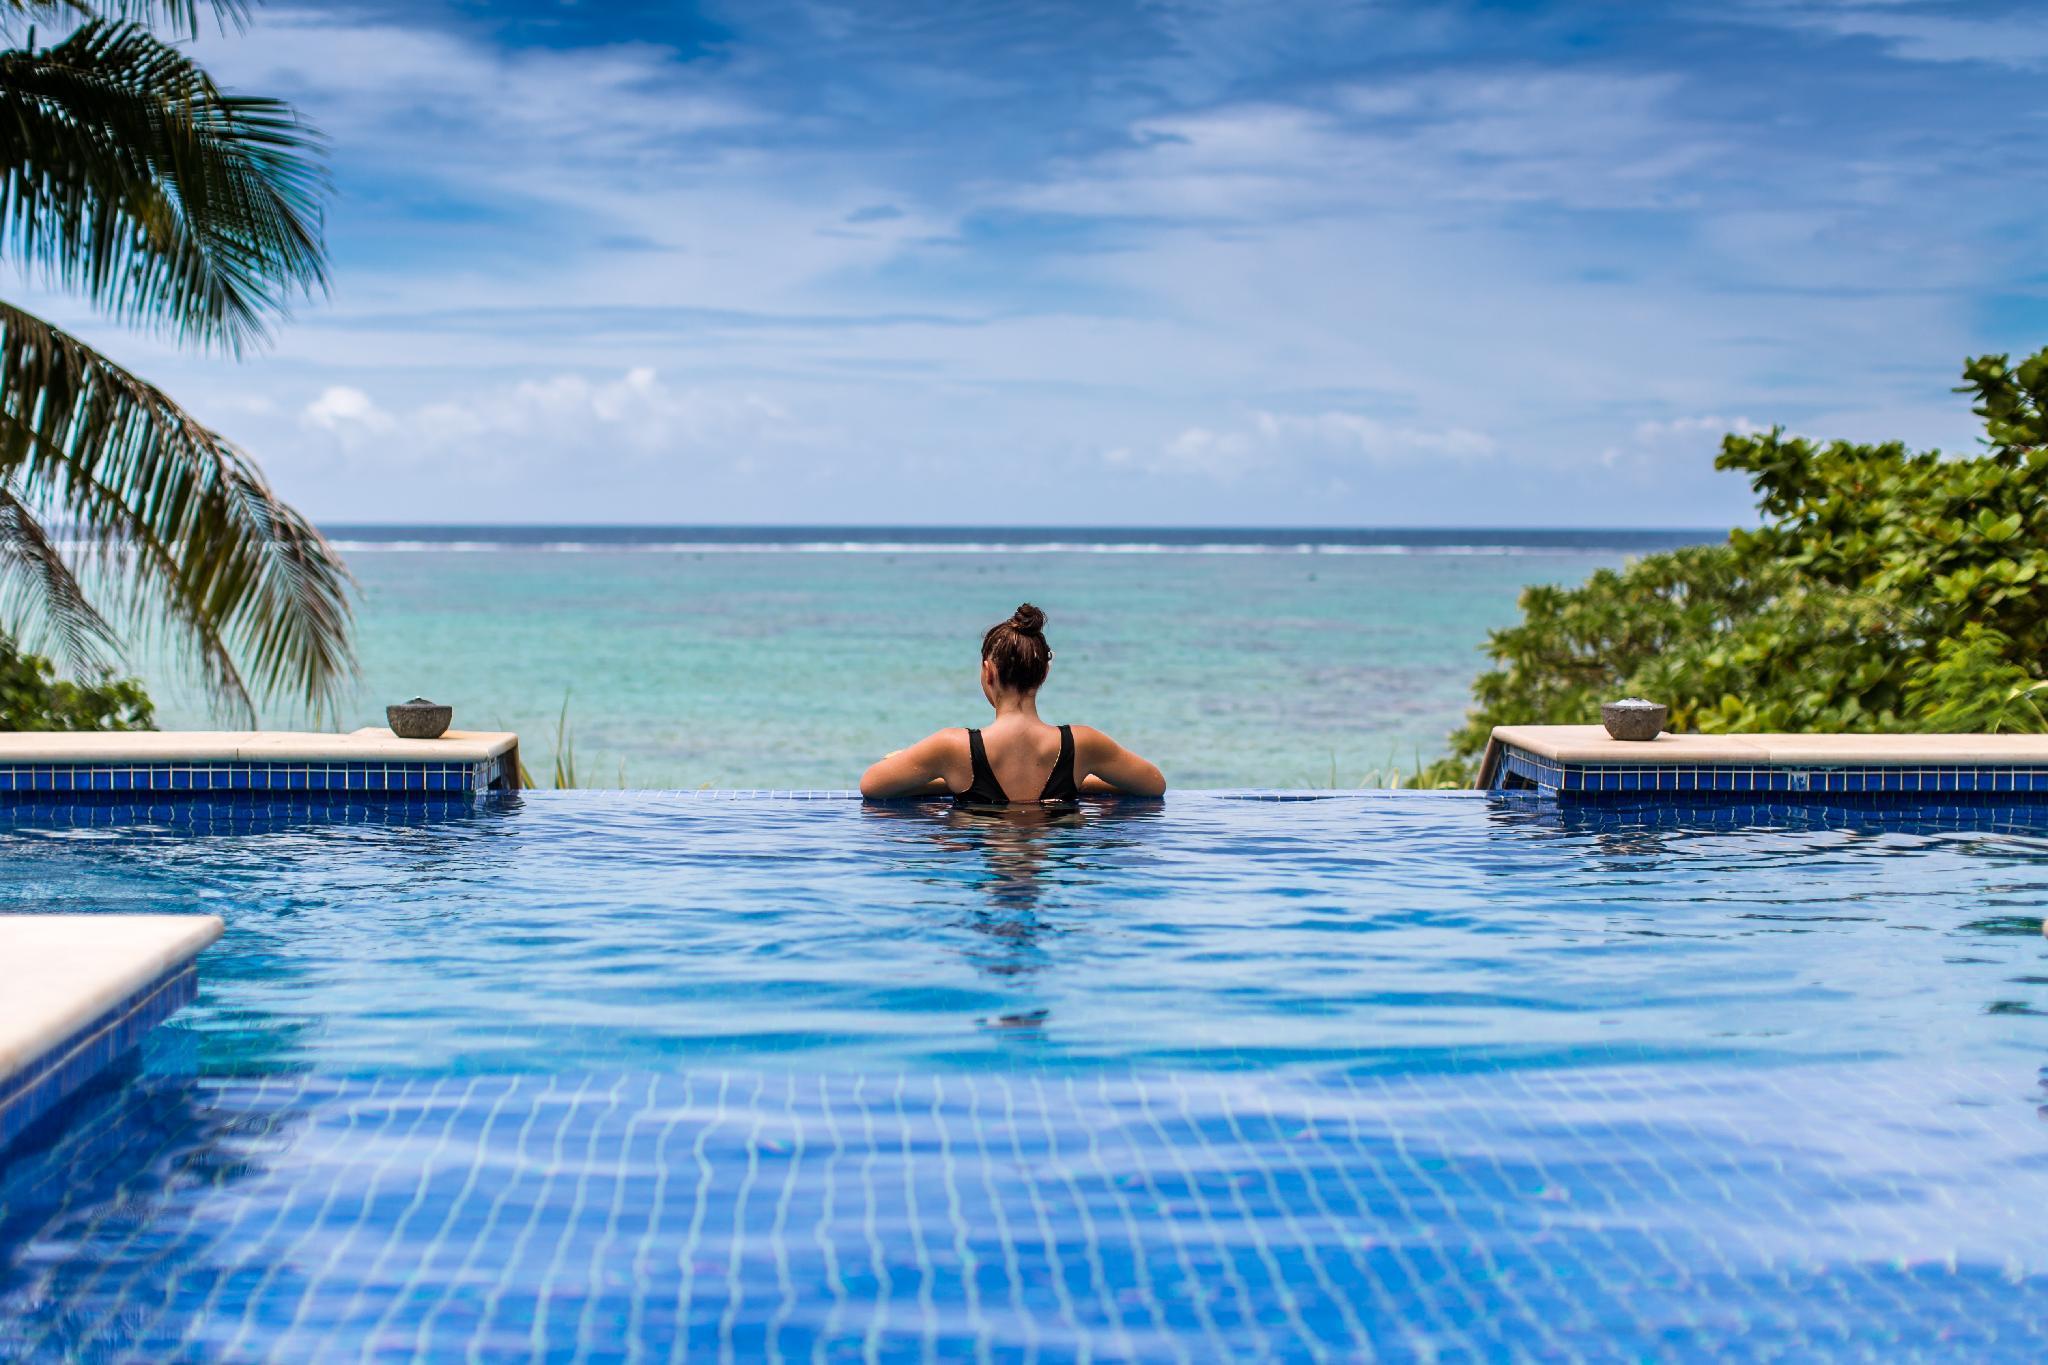 The View Fiji